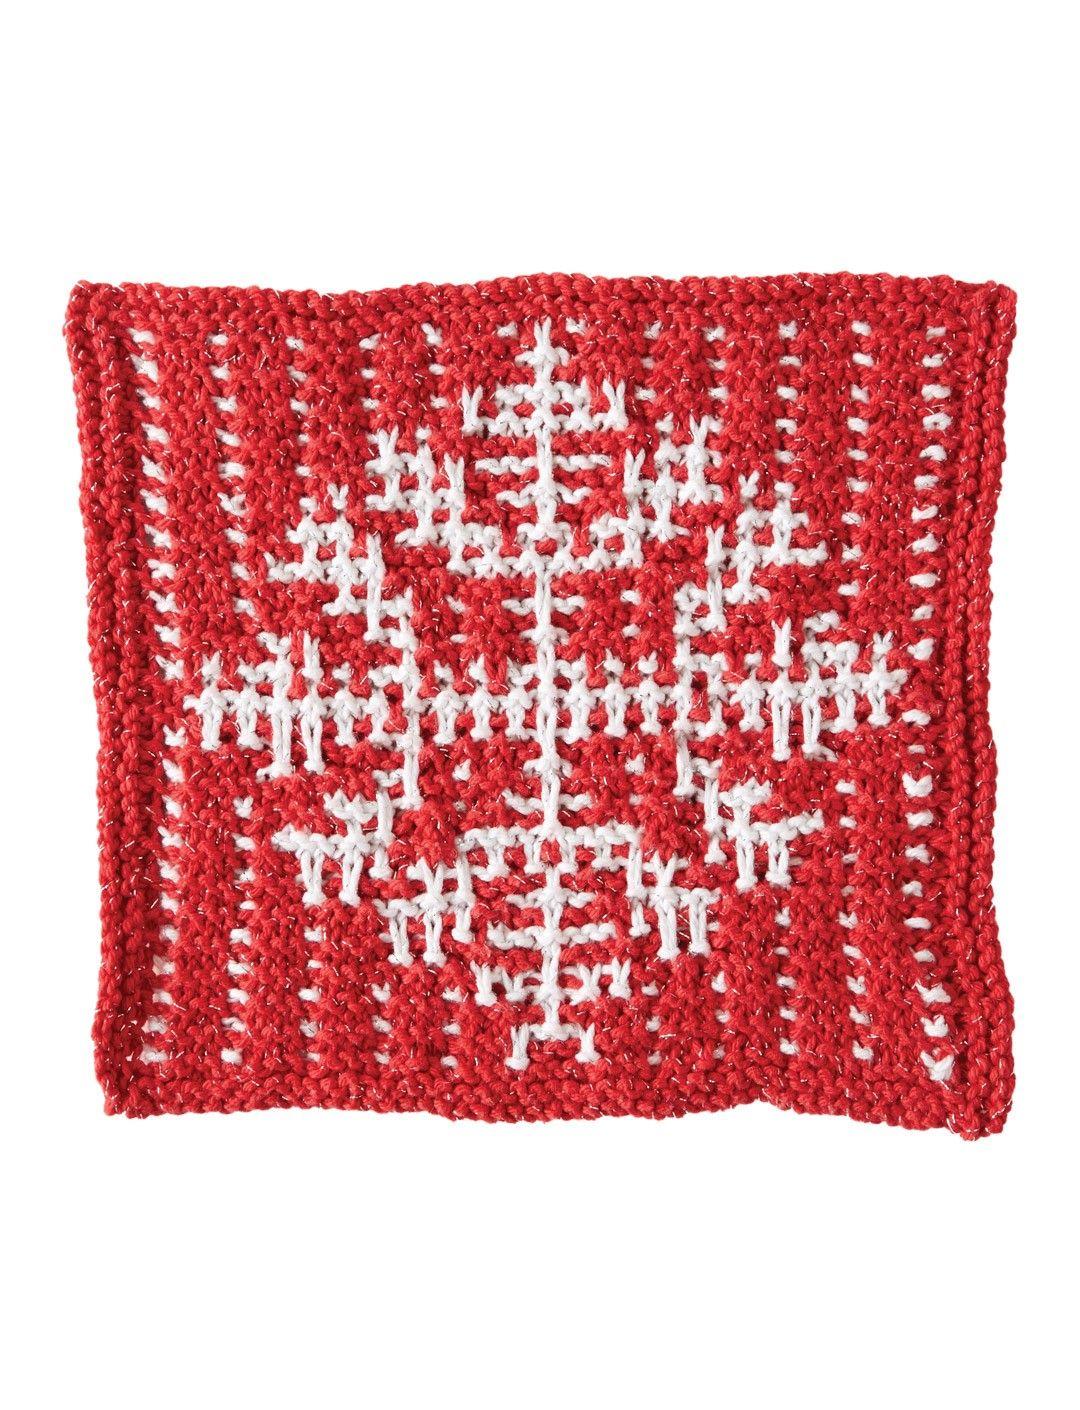 Yarnspirations.com - Bernat Mosaic Snowflake Dishcloth - Patterns ...